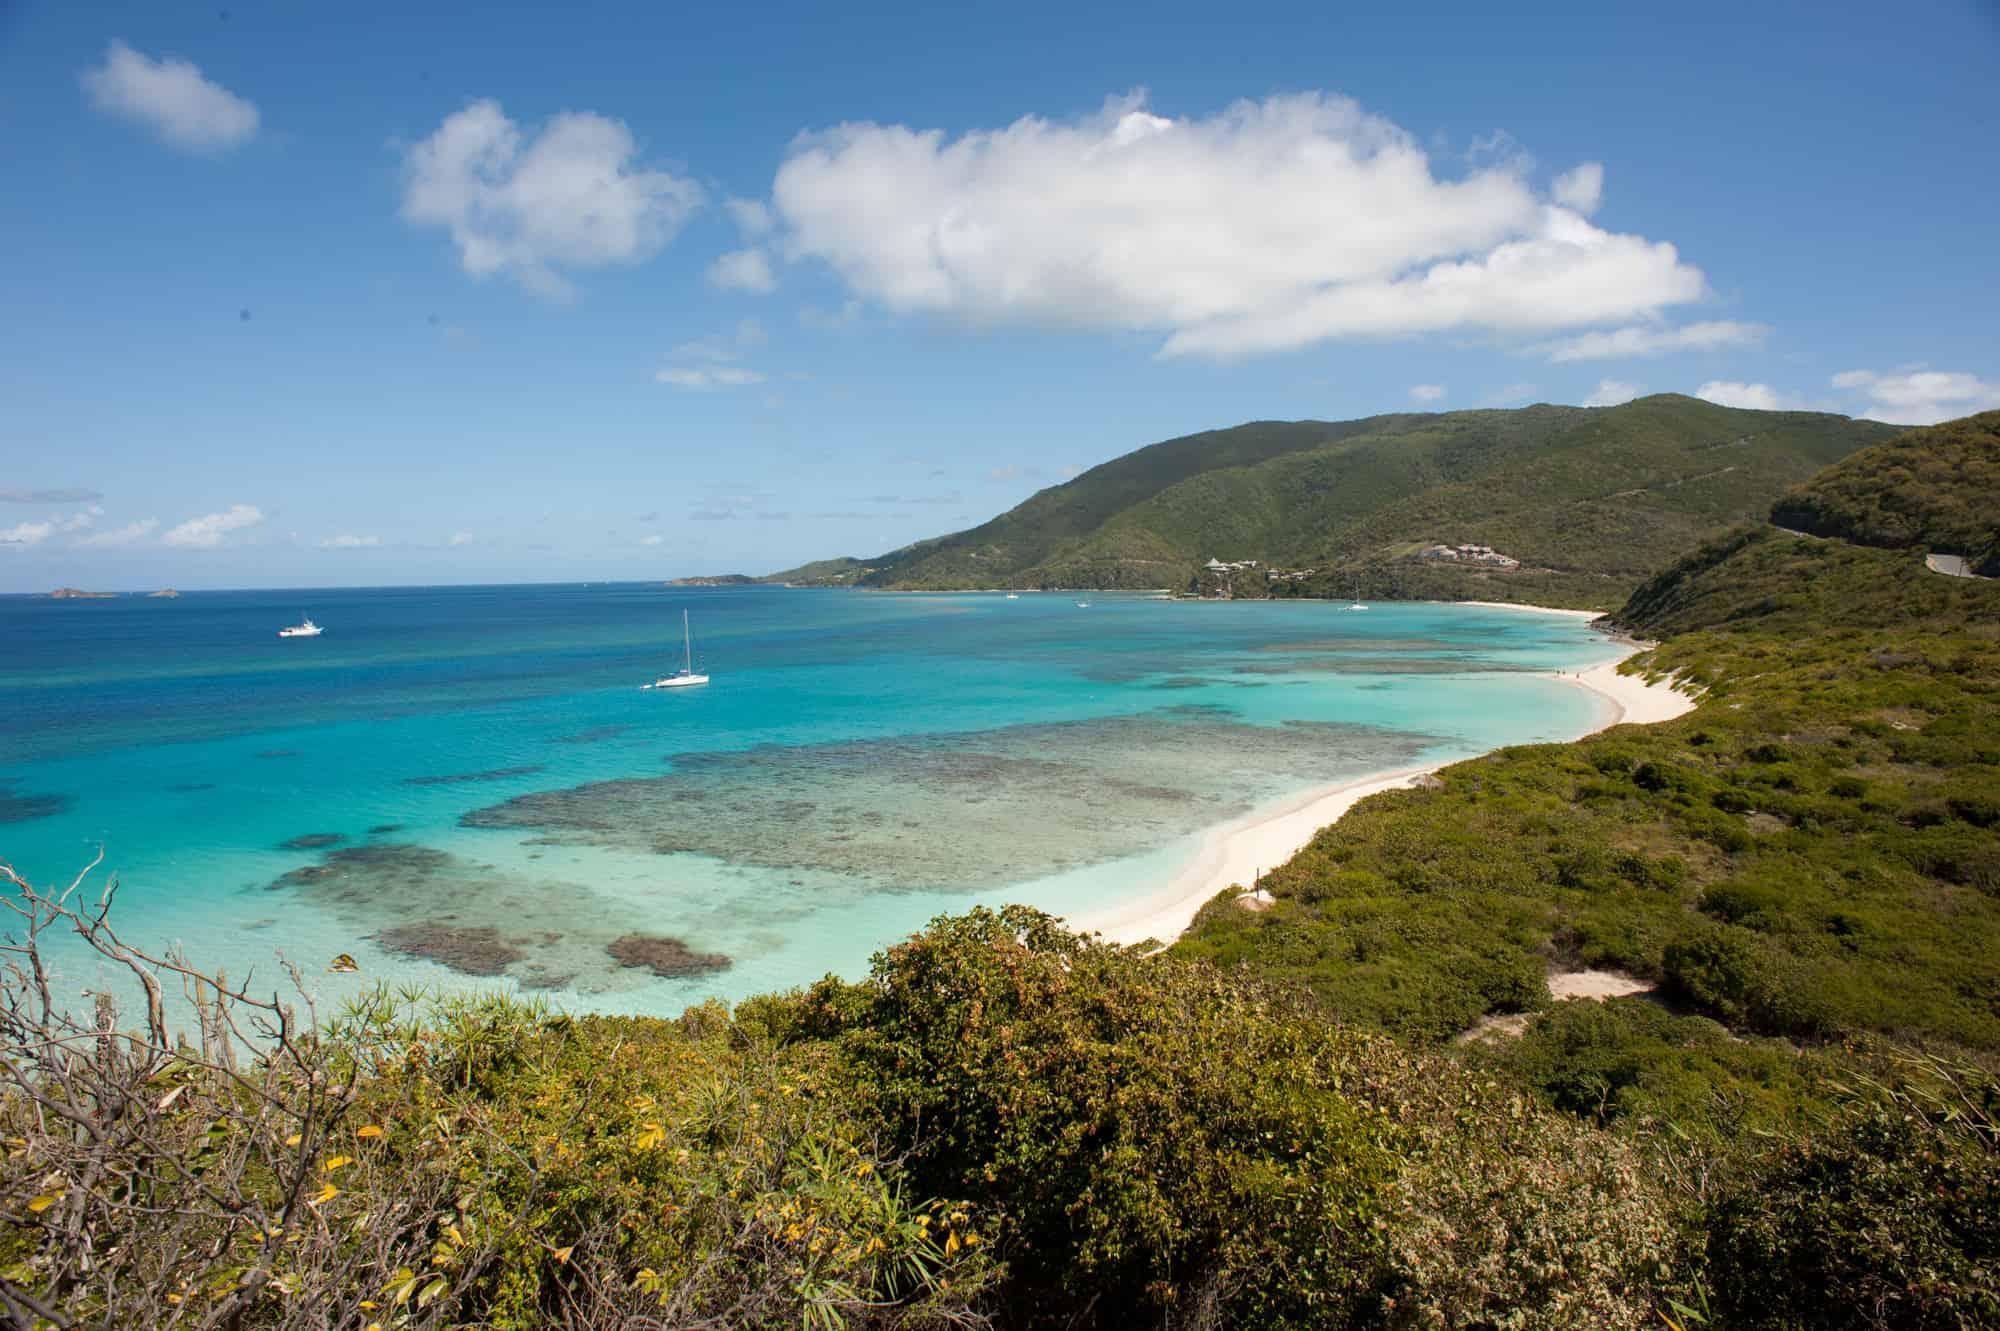 Rock Climbing Us Virgin Islands